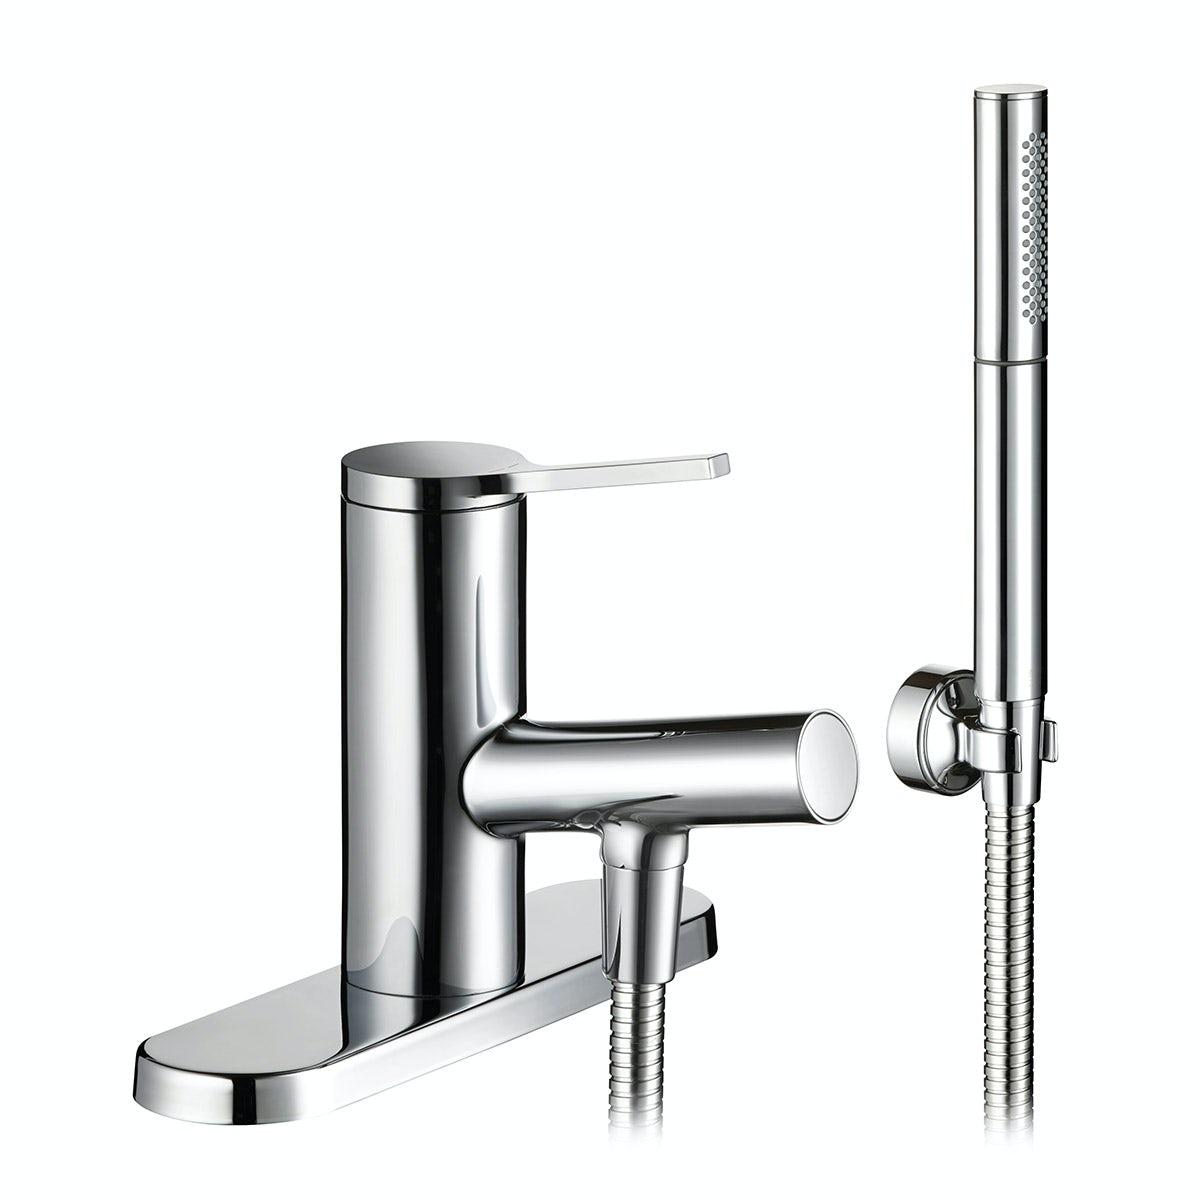 mira evolve bath shower mixer tap. Black Bedroom Furniture Sets. Home Design Ideas